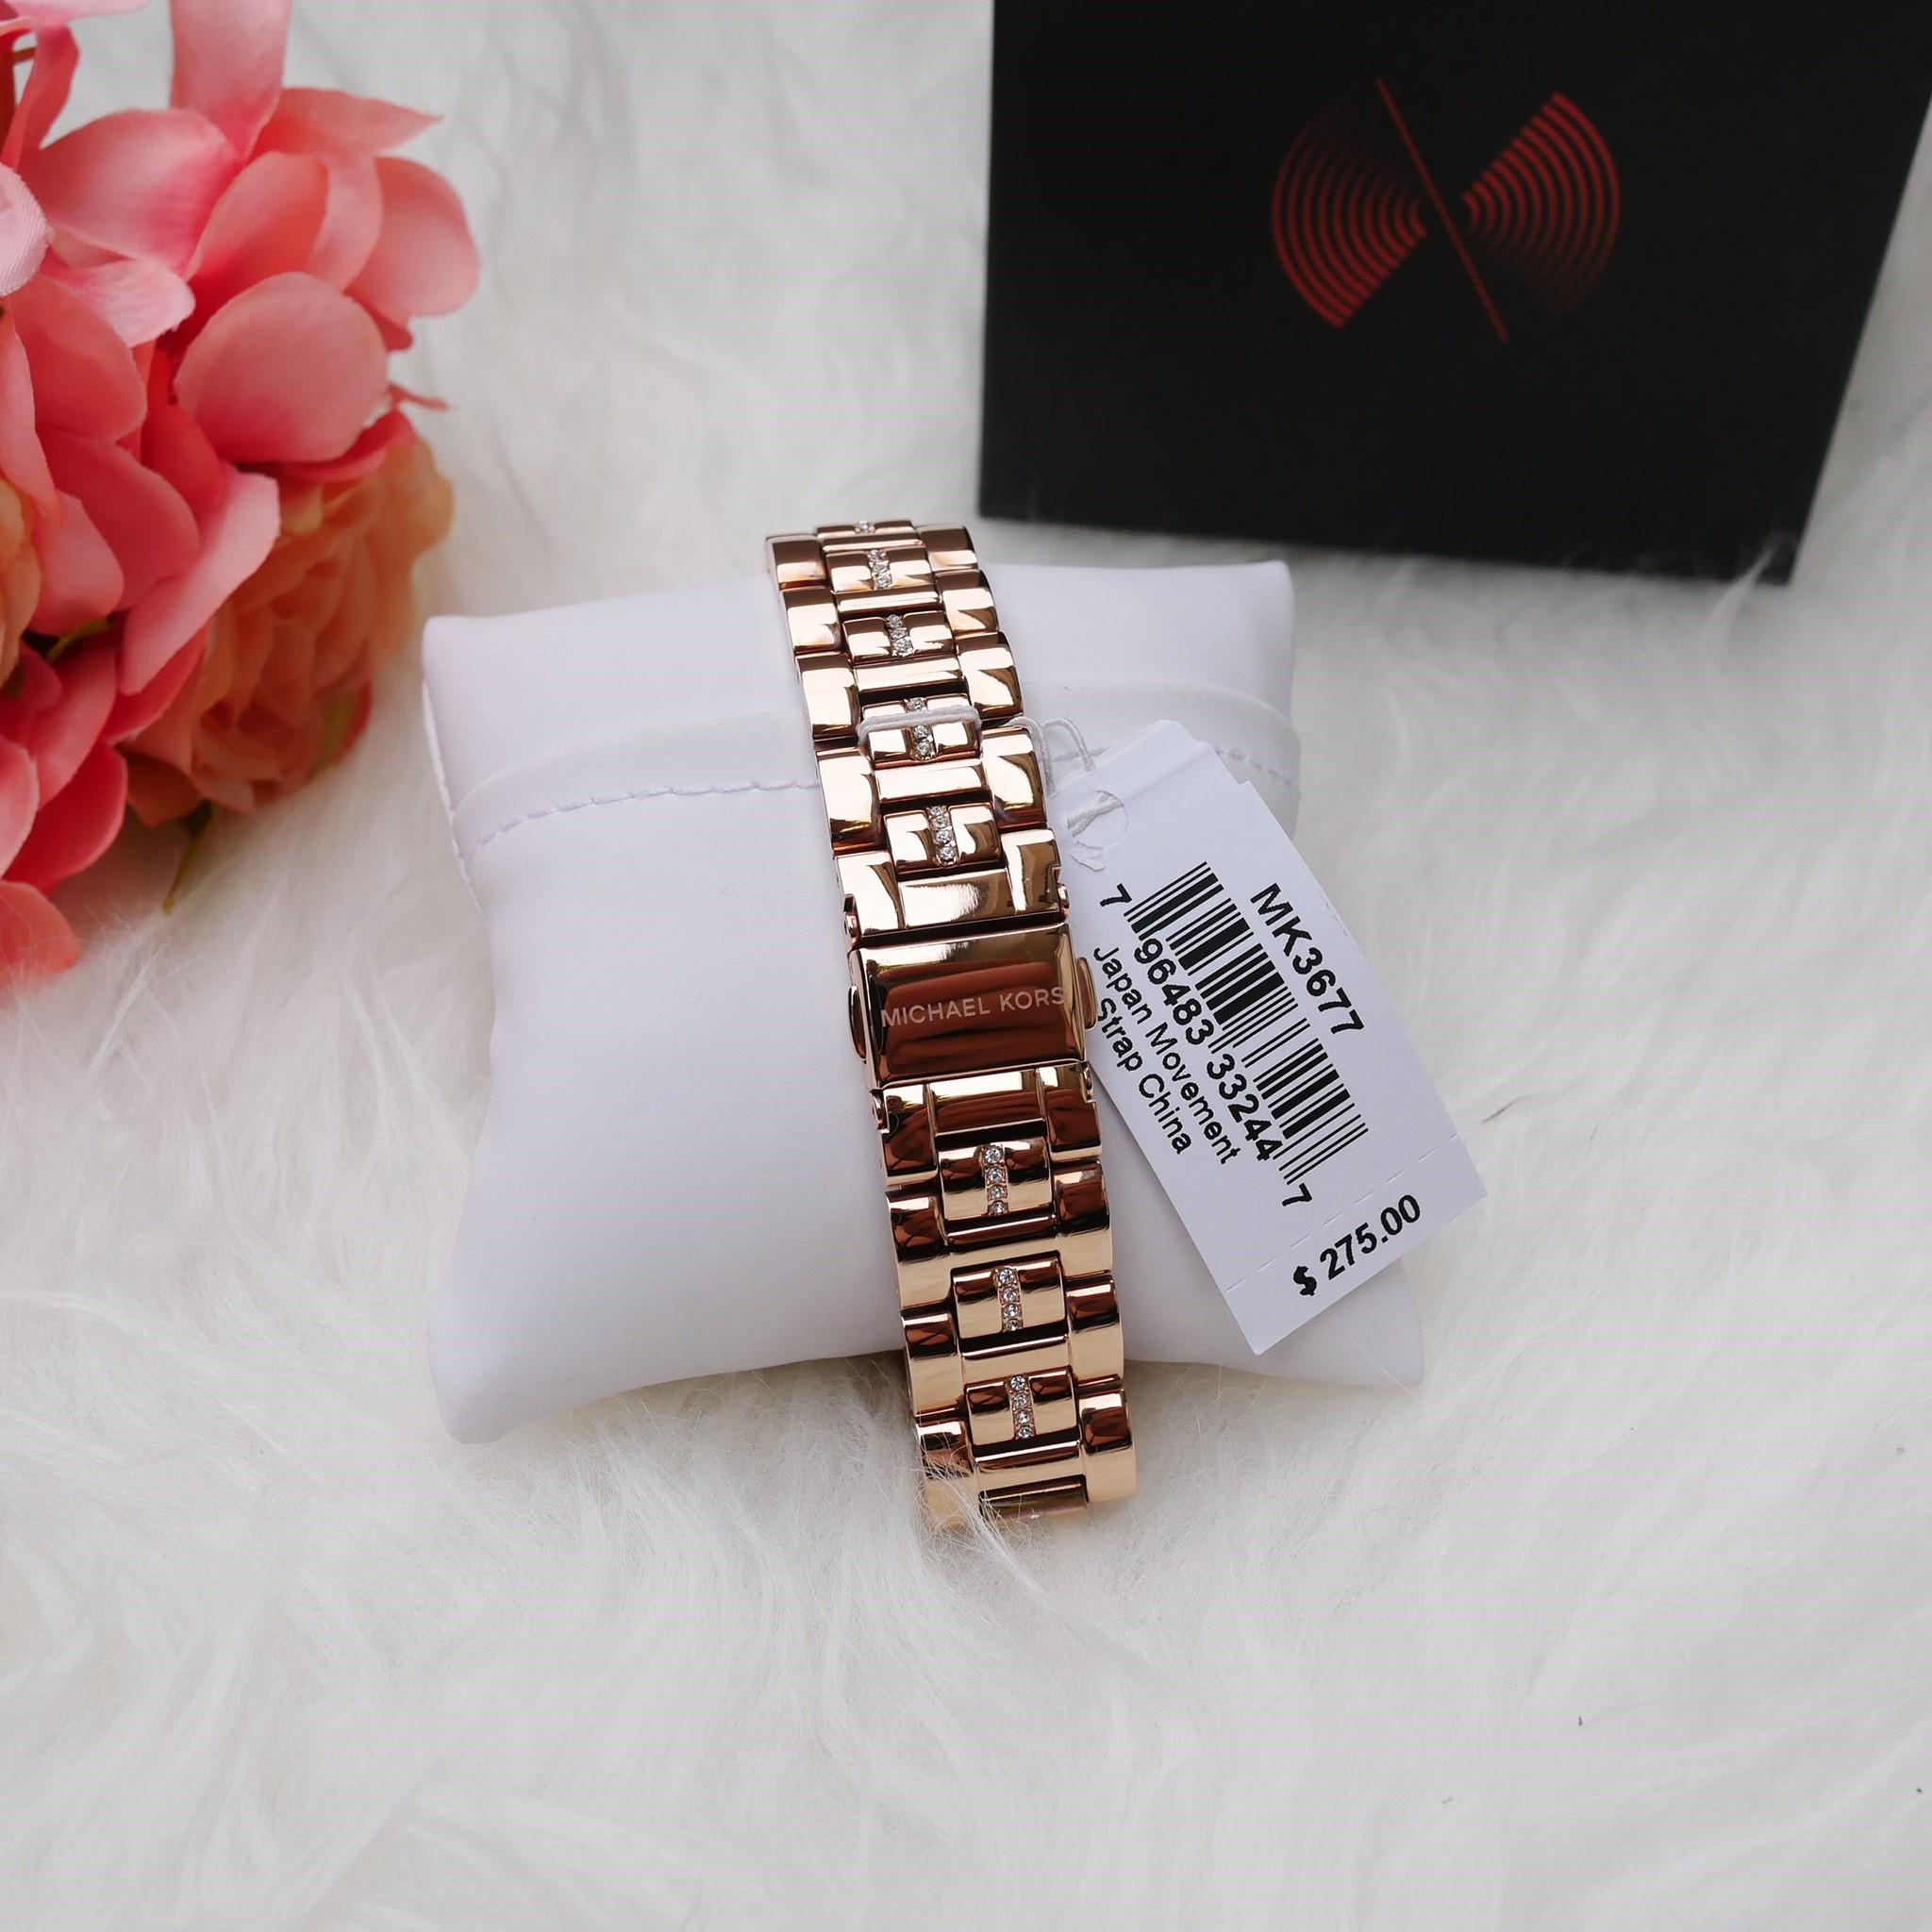 ed61666914b7 MICHAEL KORS Libby Rose Gold Dial Ladies Watch MK3677 - Little ...